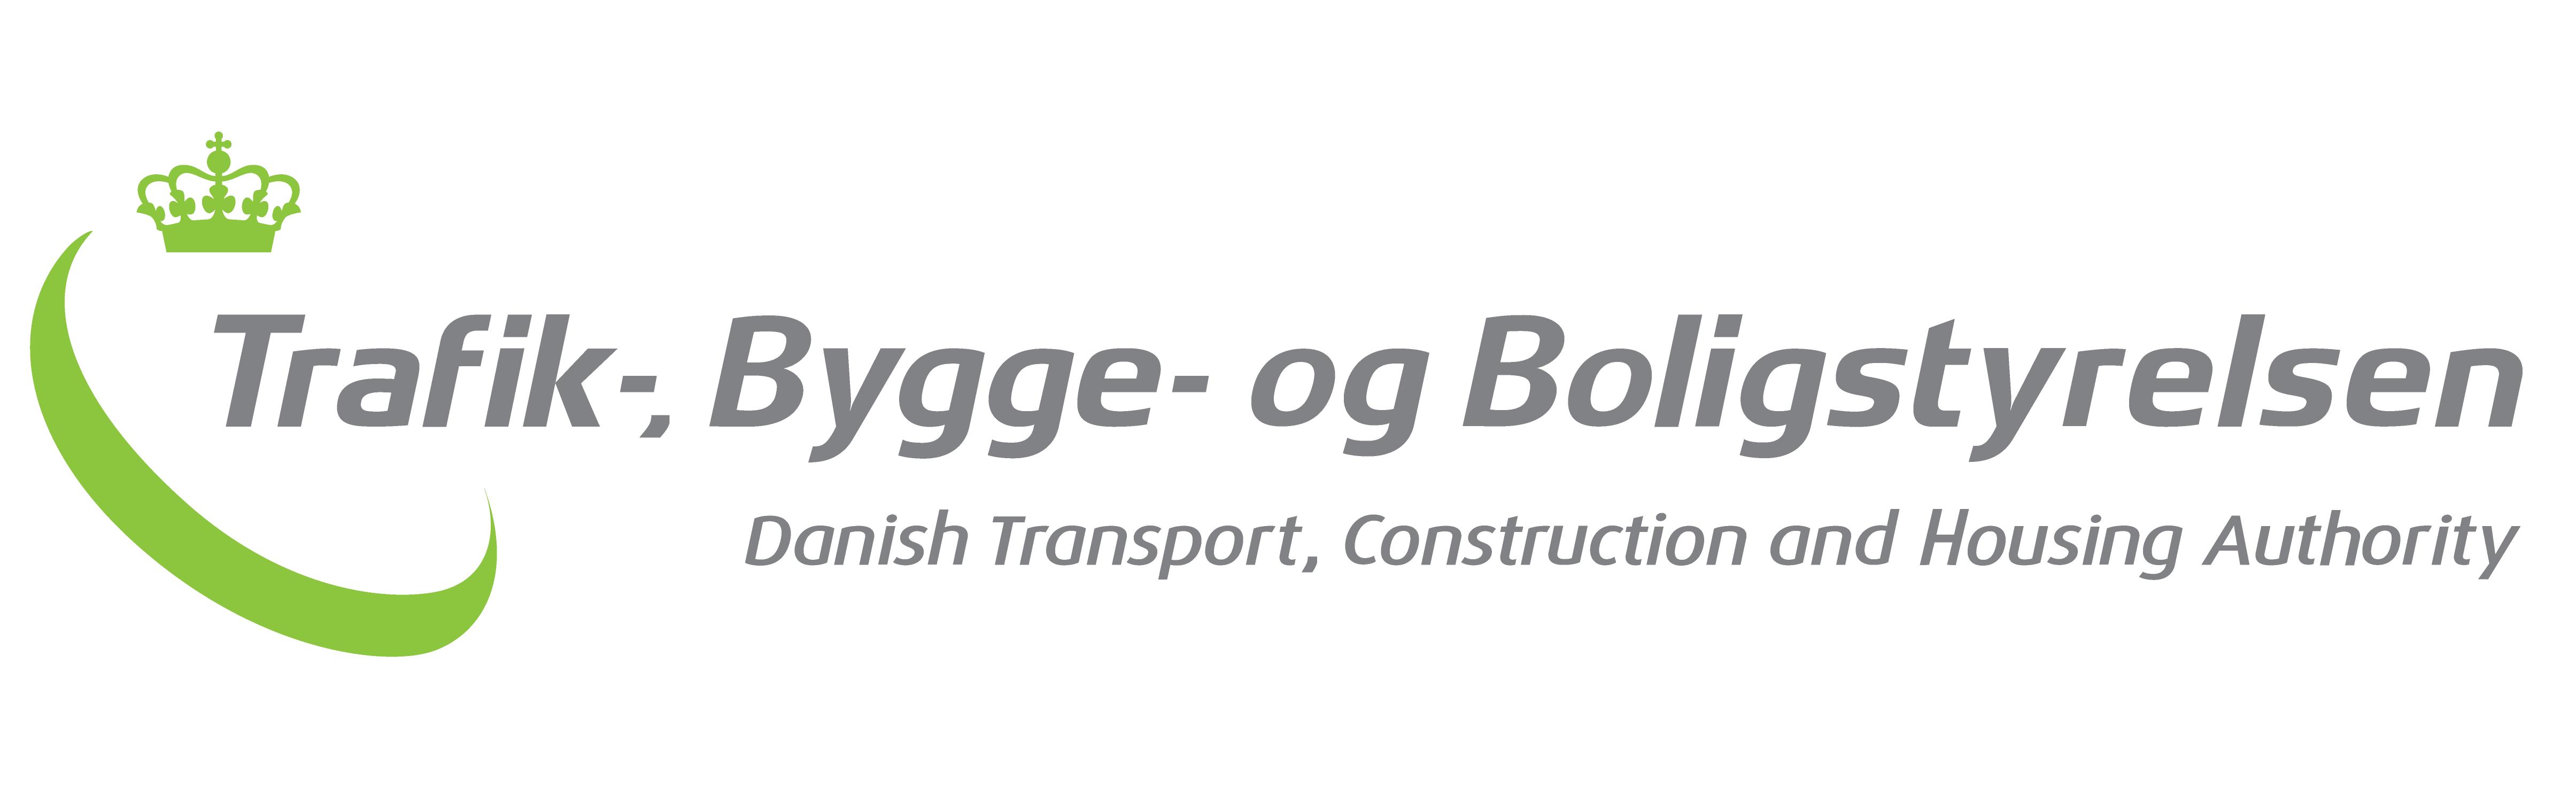 trafik-shop.dk